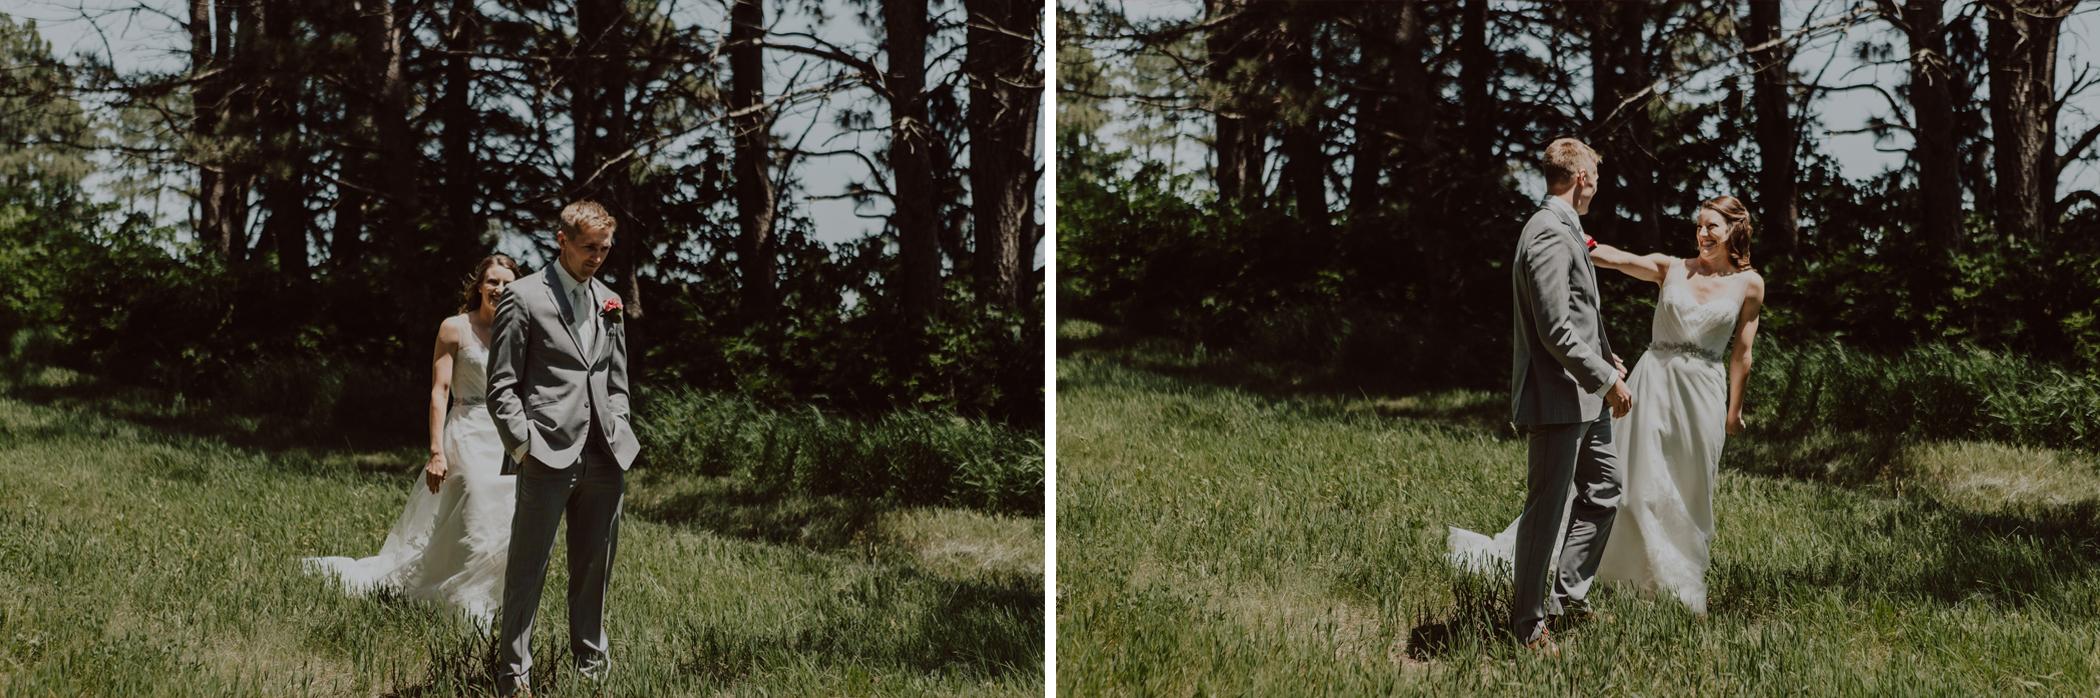 side-by-side-horizontal3.jpg